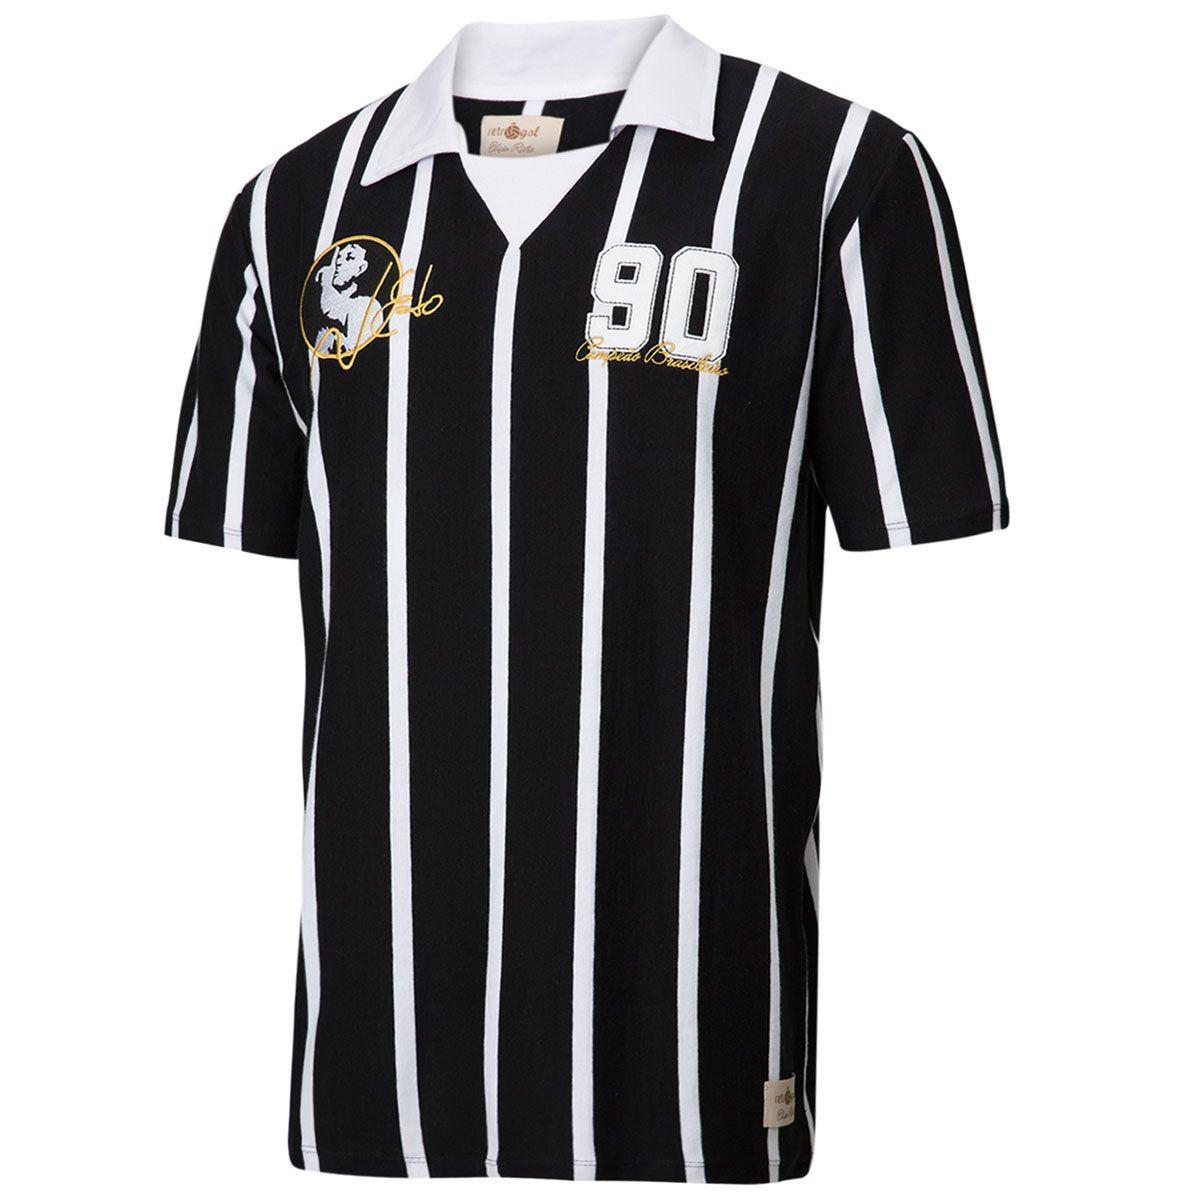 Camisa Retrô Gol Réplica Neto Ex - Corinthians 1990 Torcedor